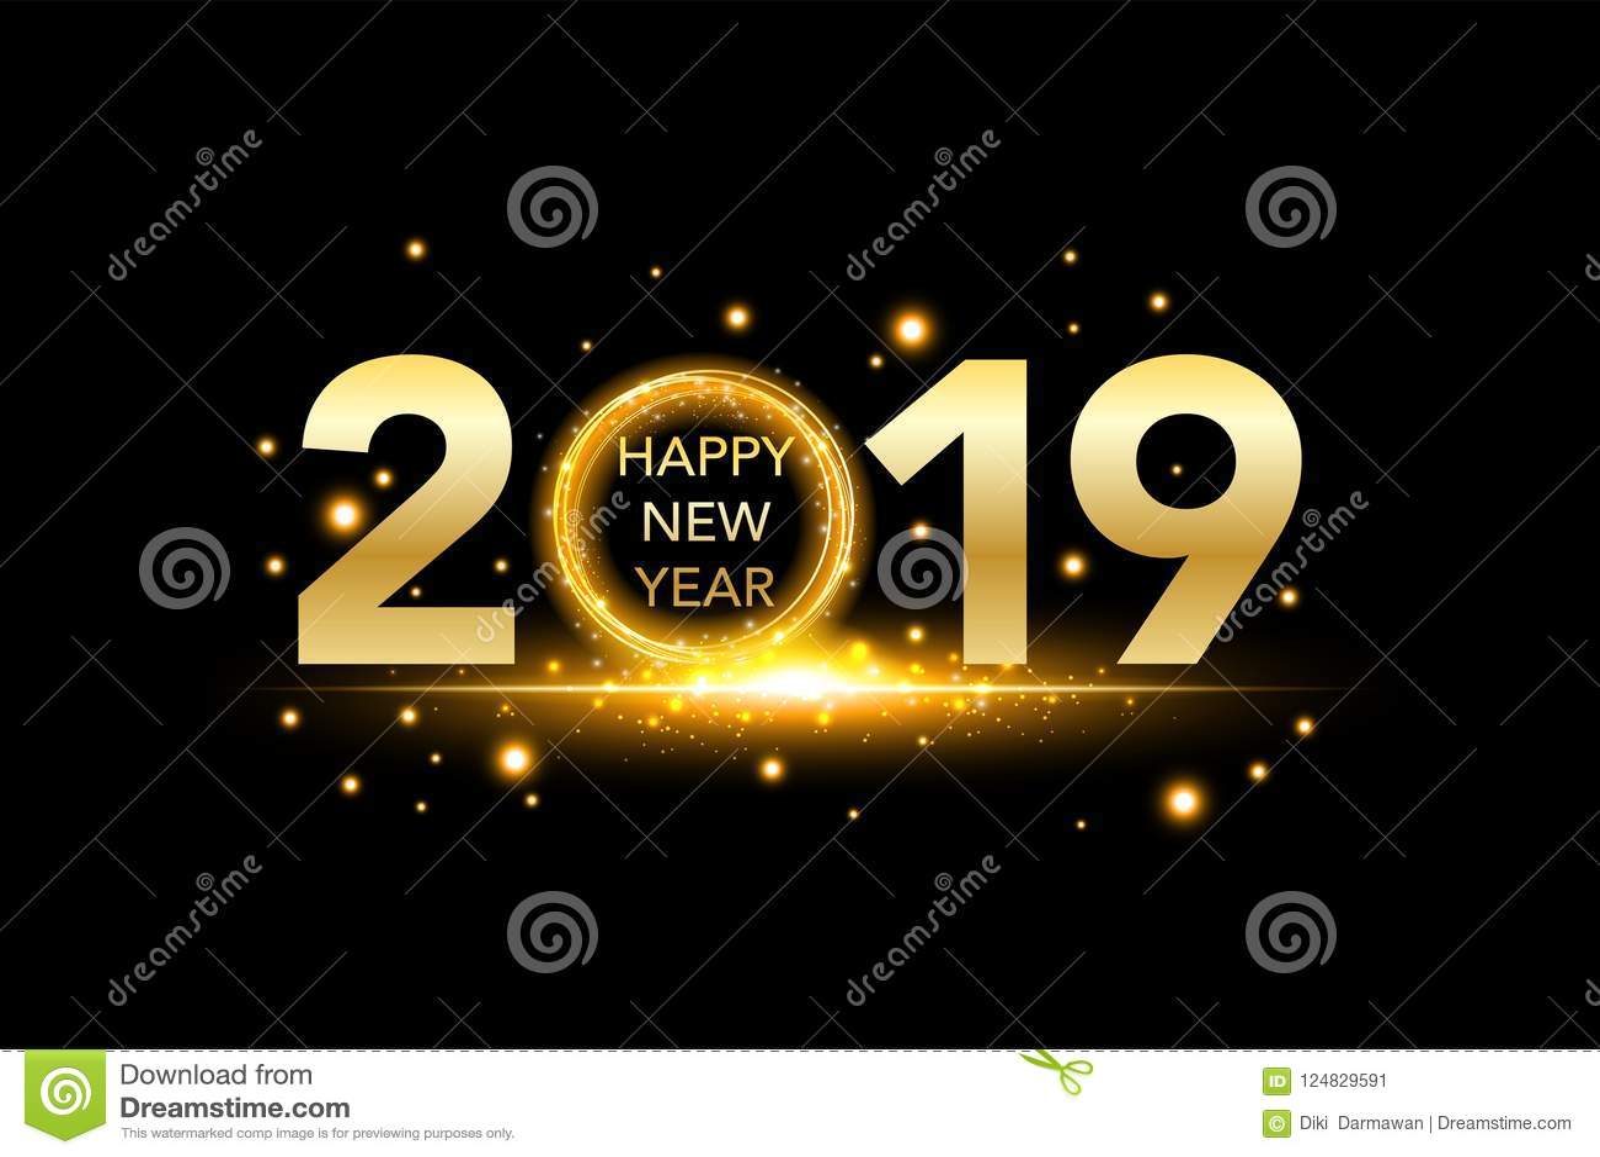 happy new year 2019 background with gold glitter confetti splatter festive premium design template for